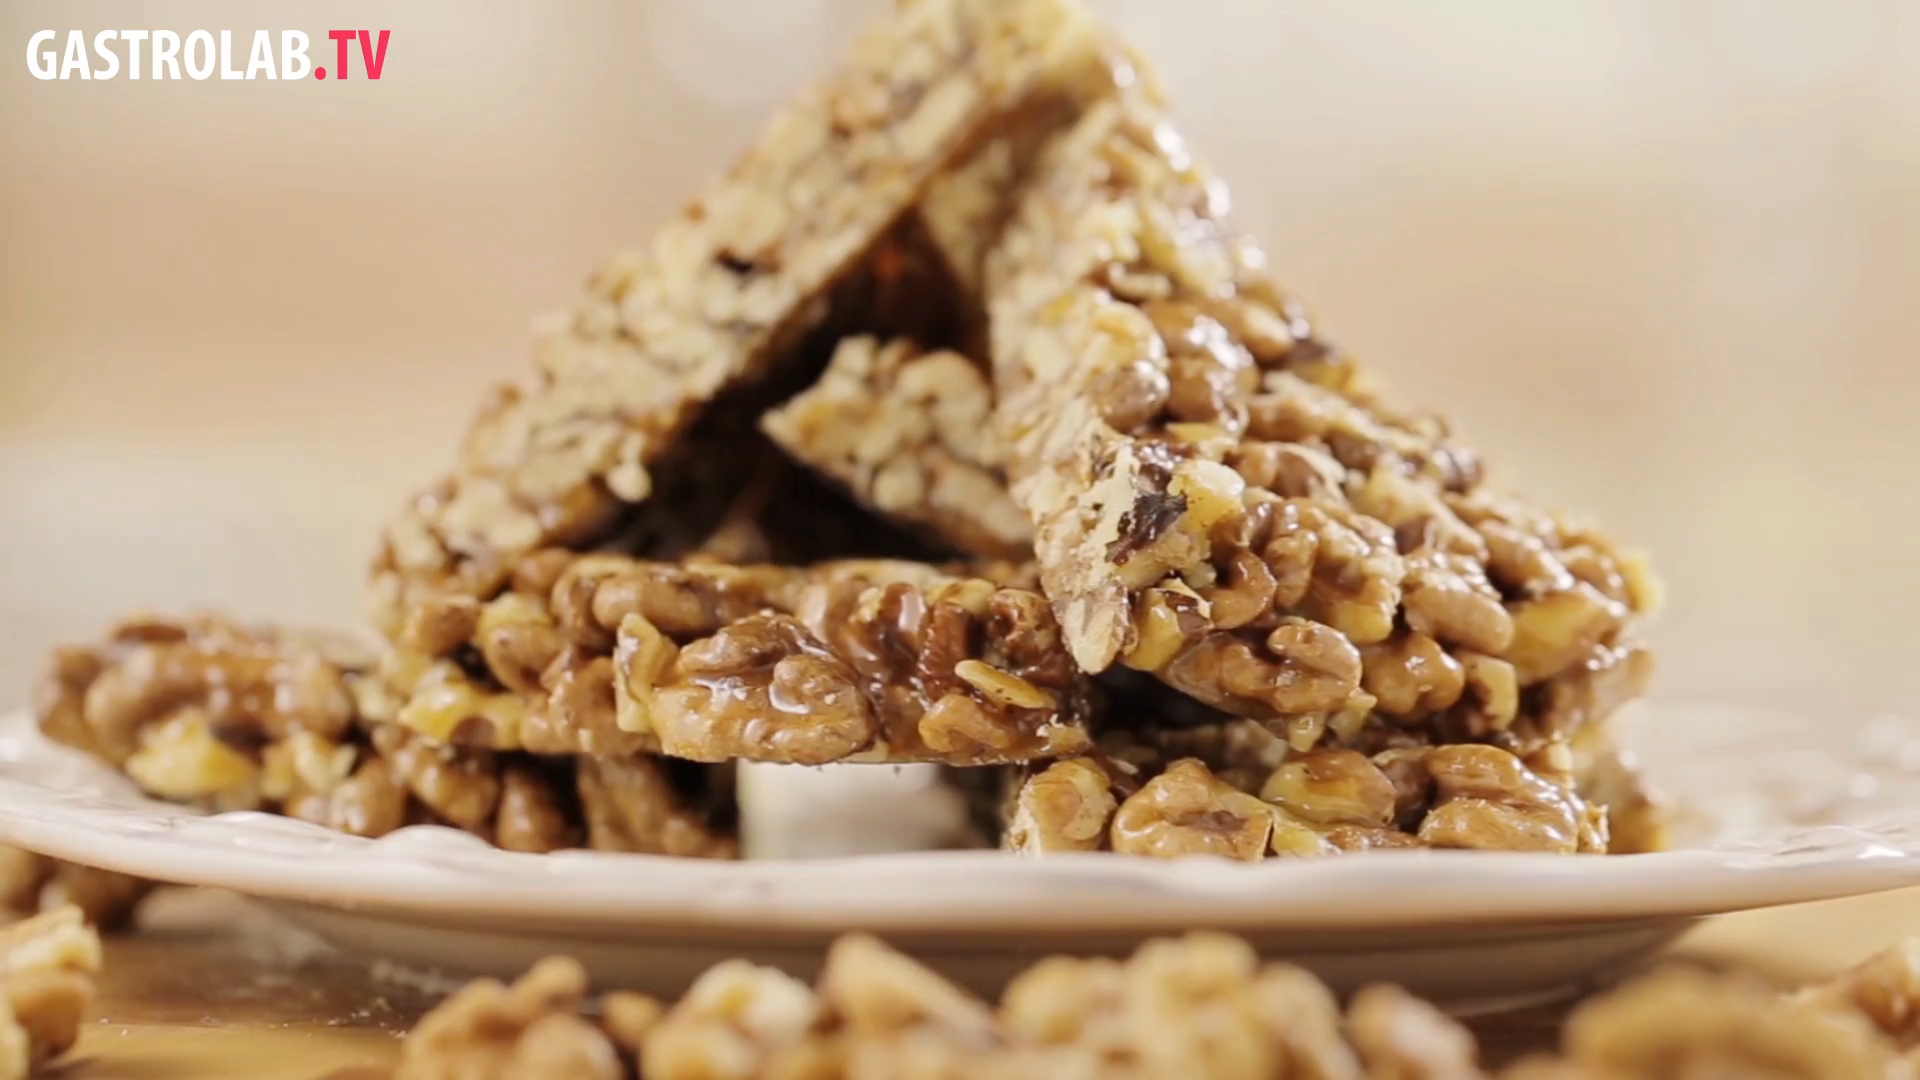 How to Make Gozinaki - Nuts Cooked with Honey